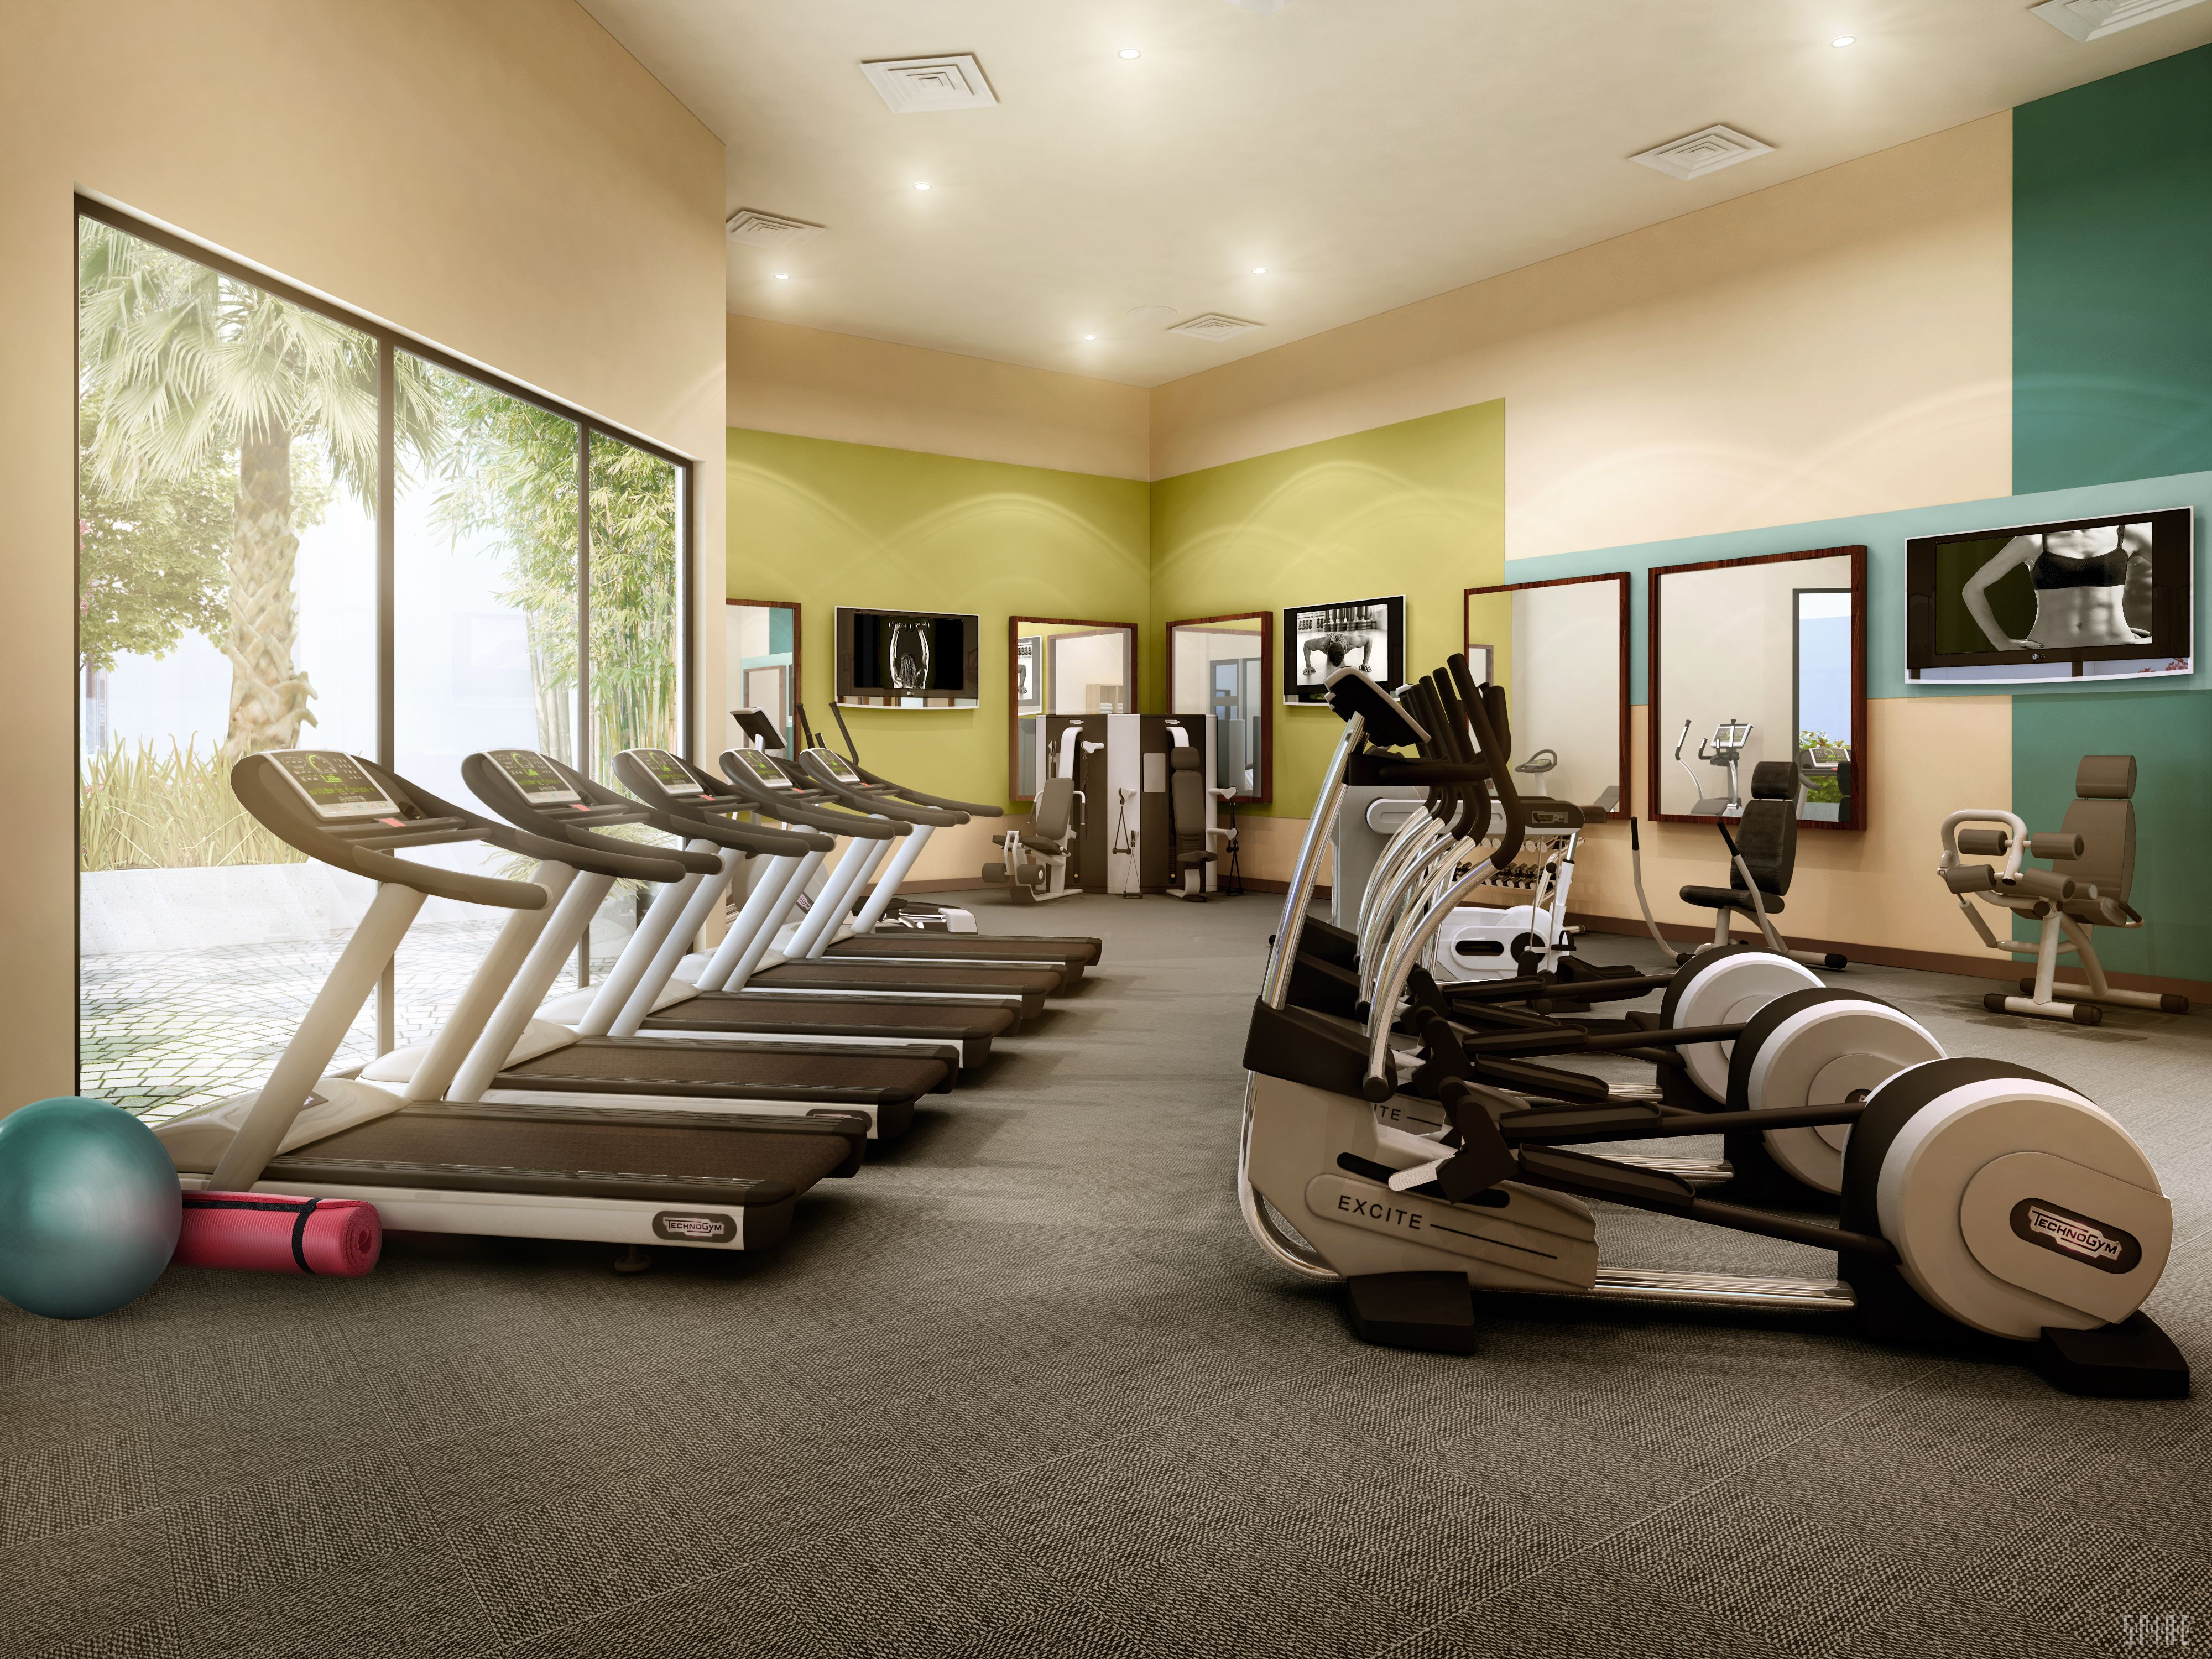 Fitness center apartment fitness center home